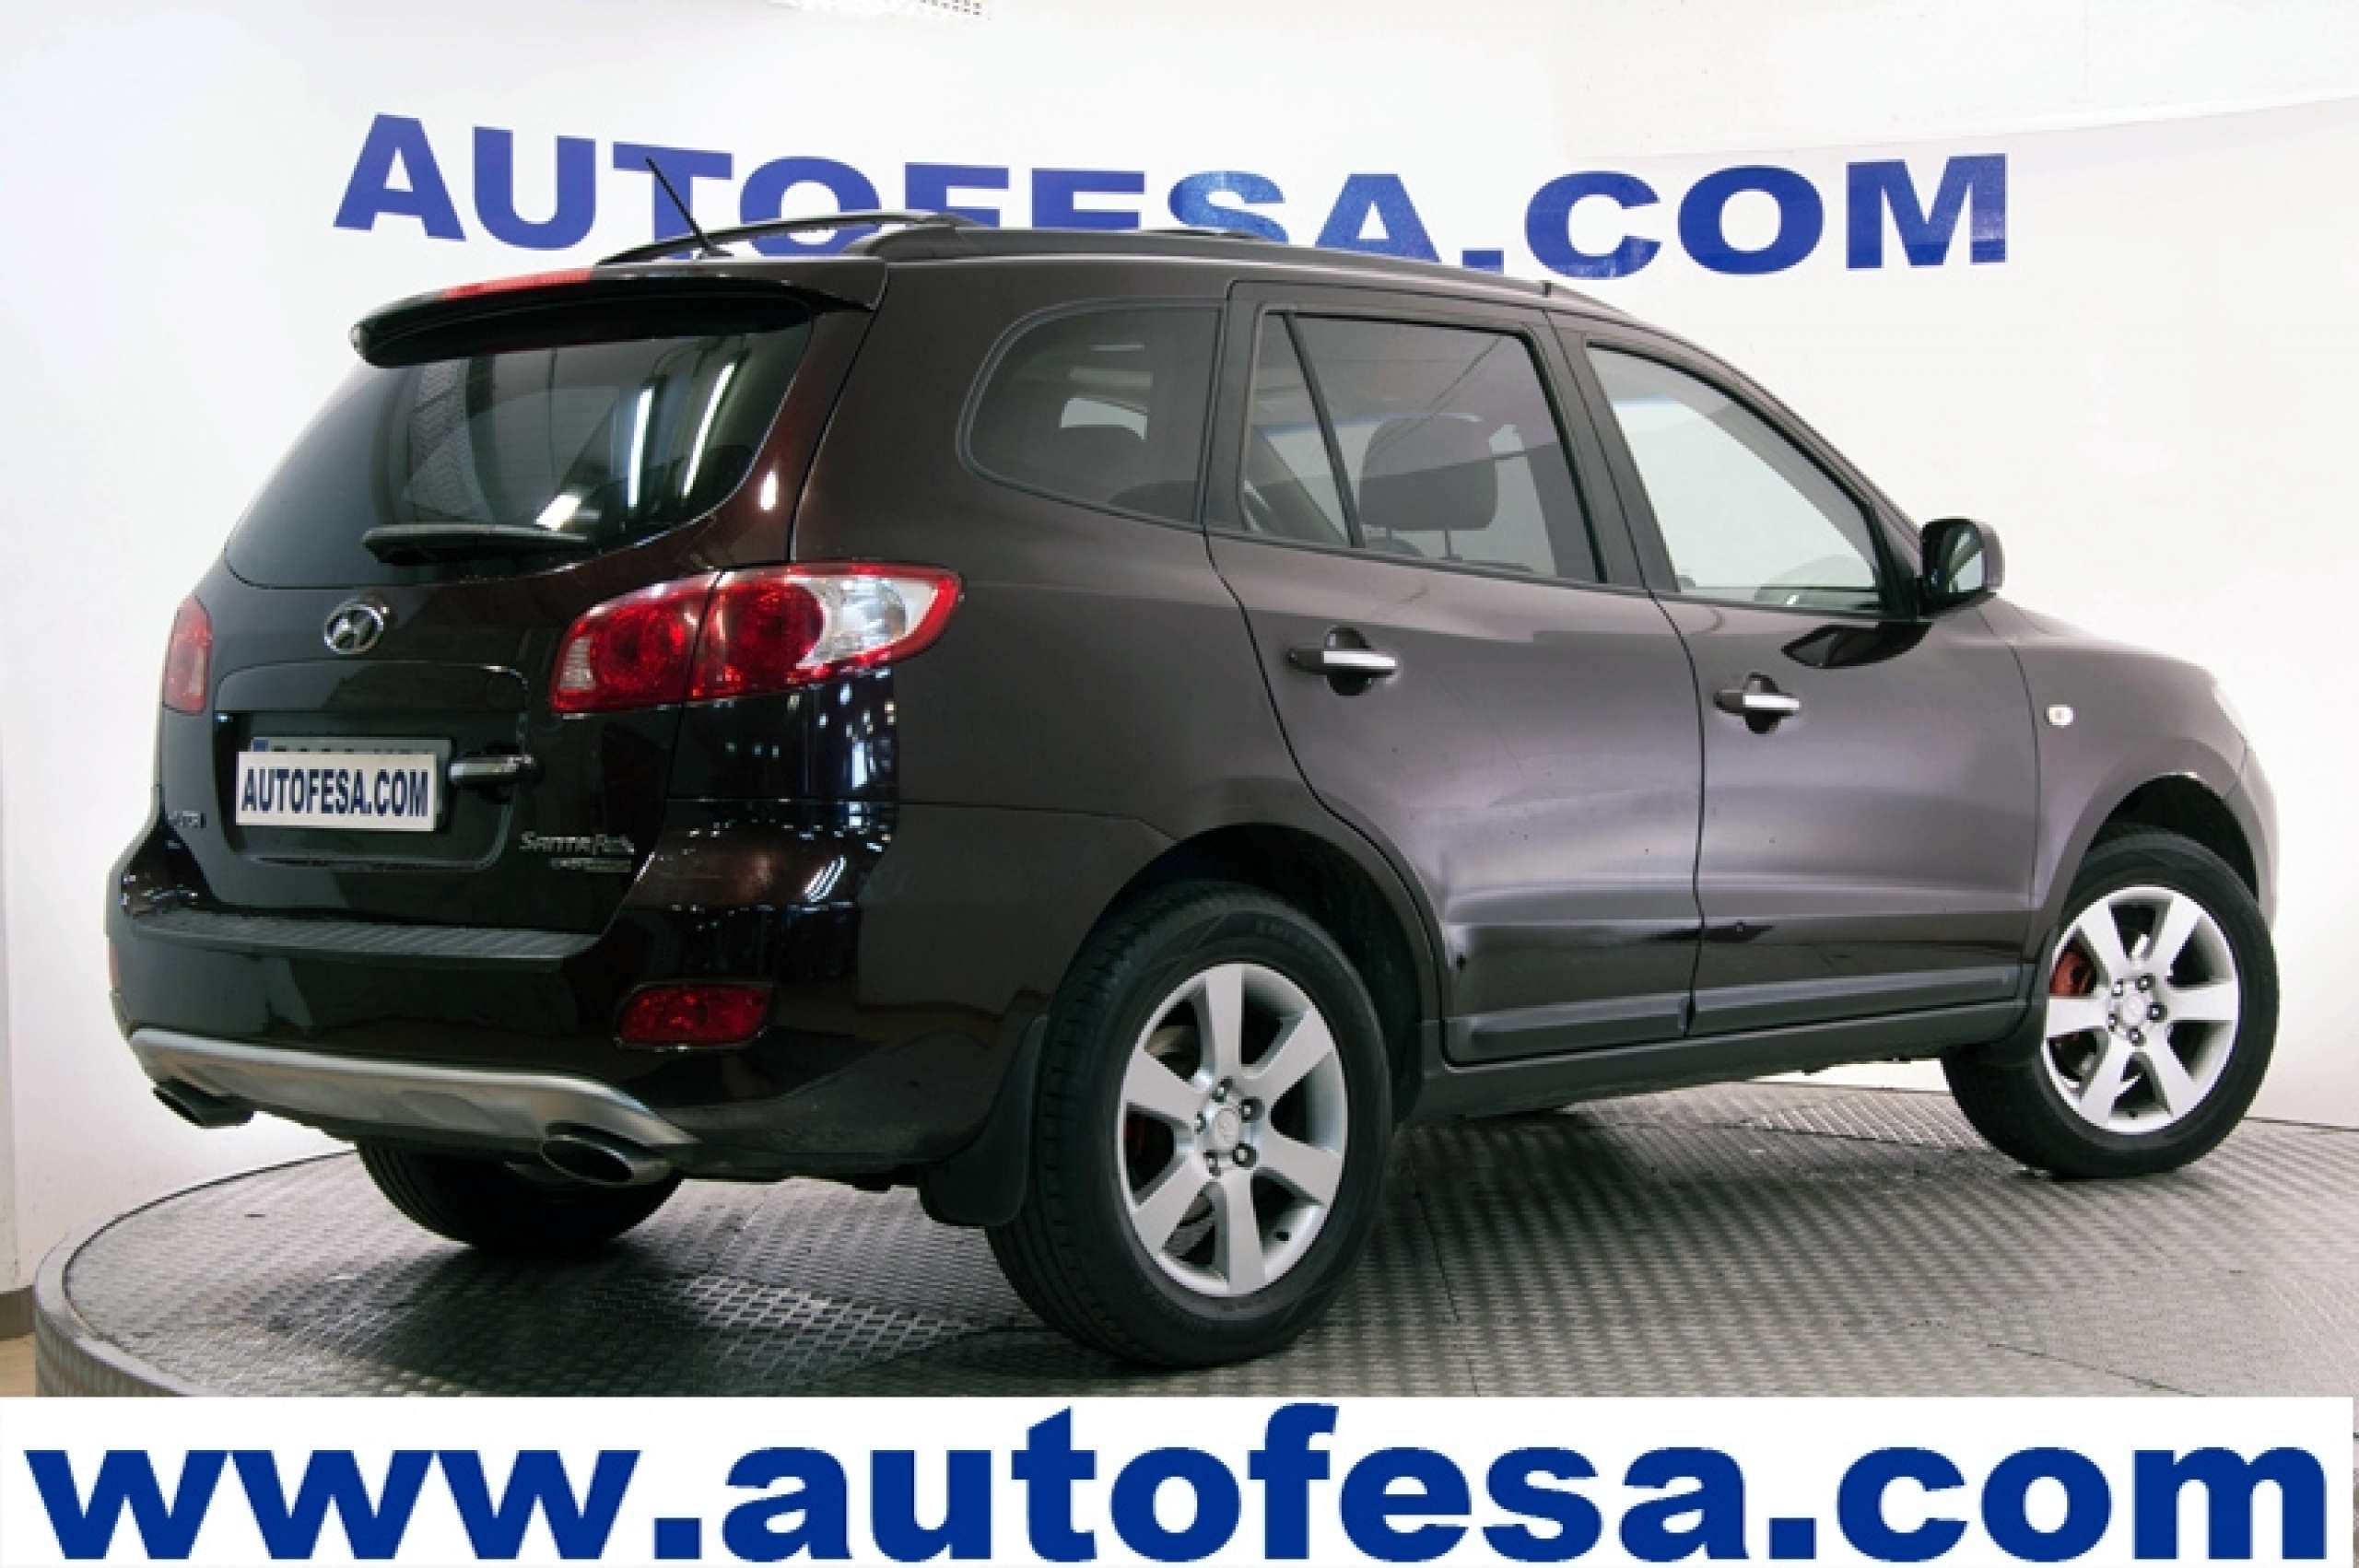 Hyundai Santa Fe 2.2 CRDI 155cv Style Auto 5p - Foto 6